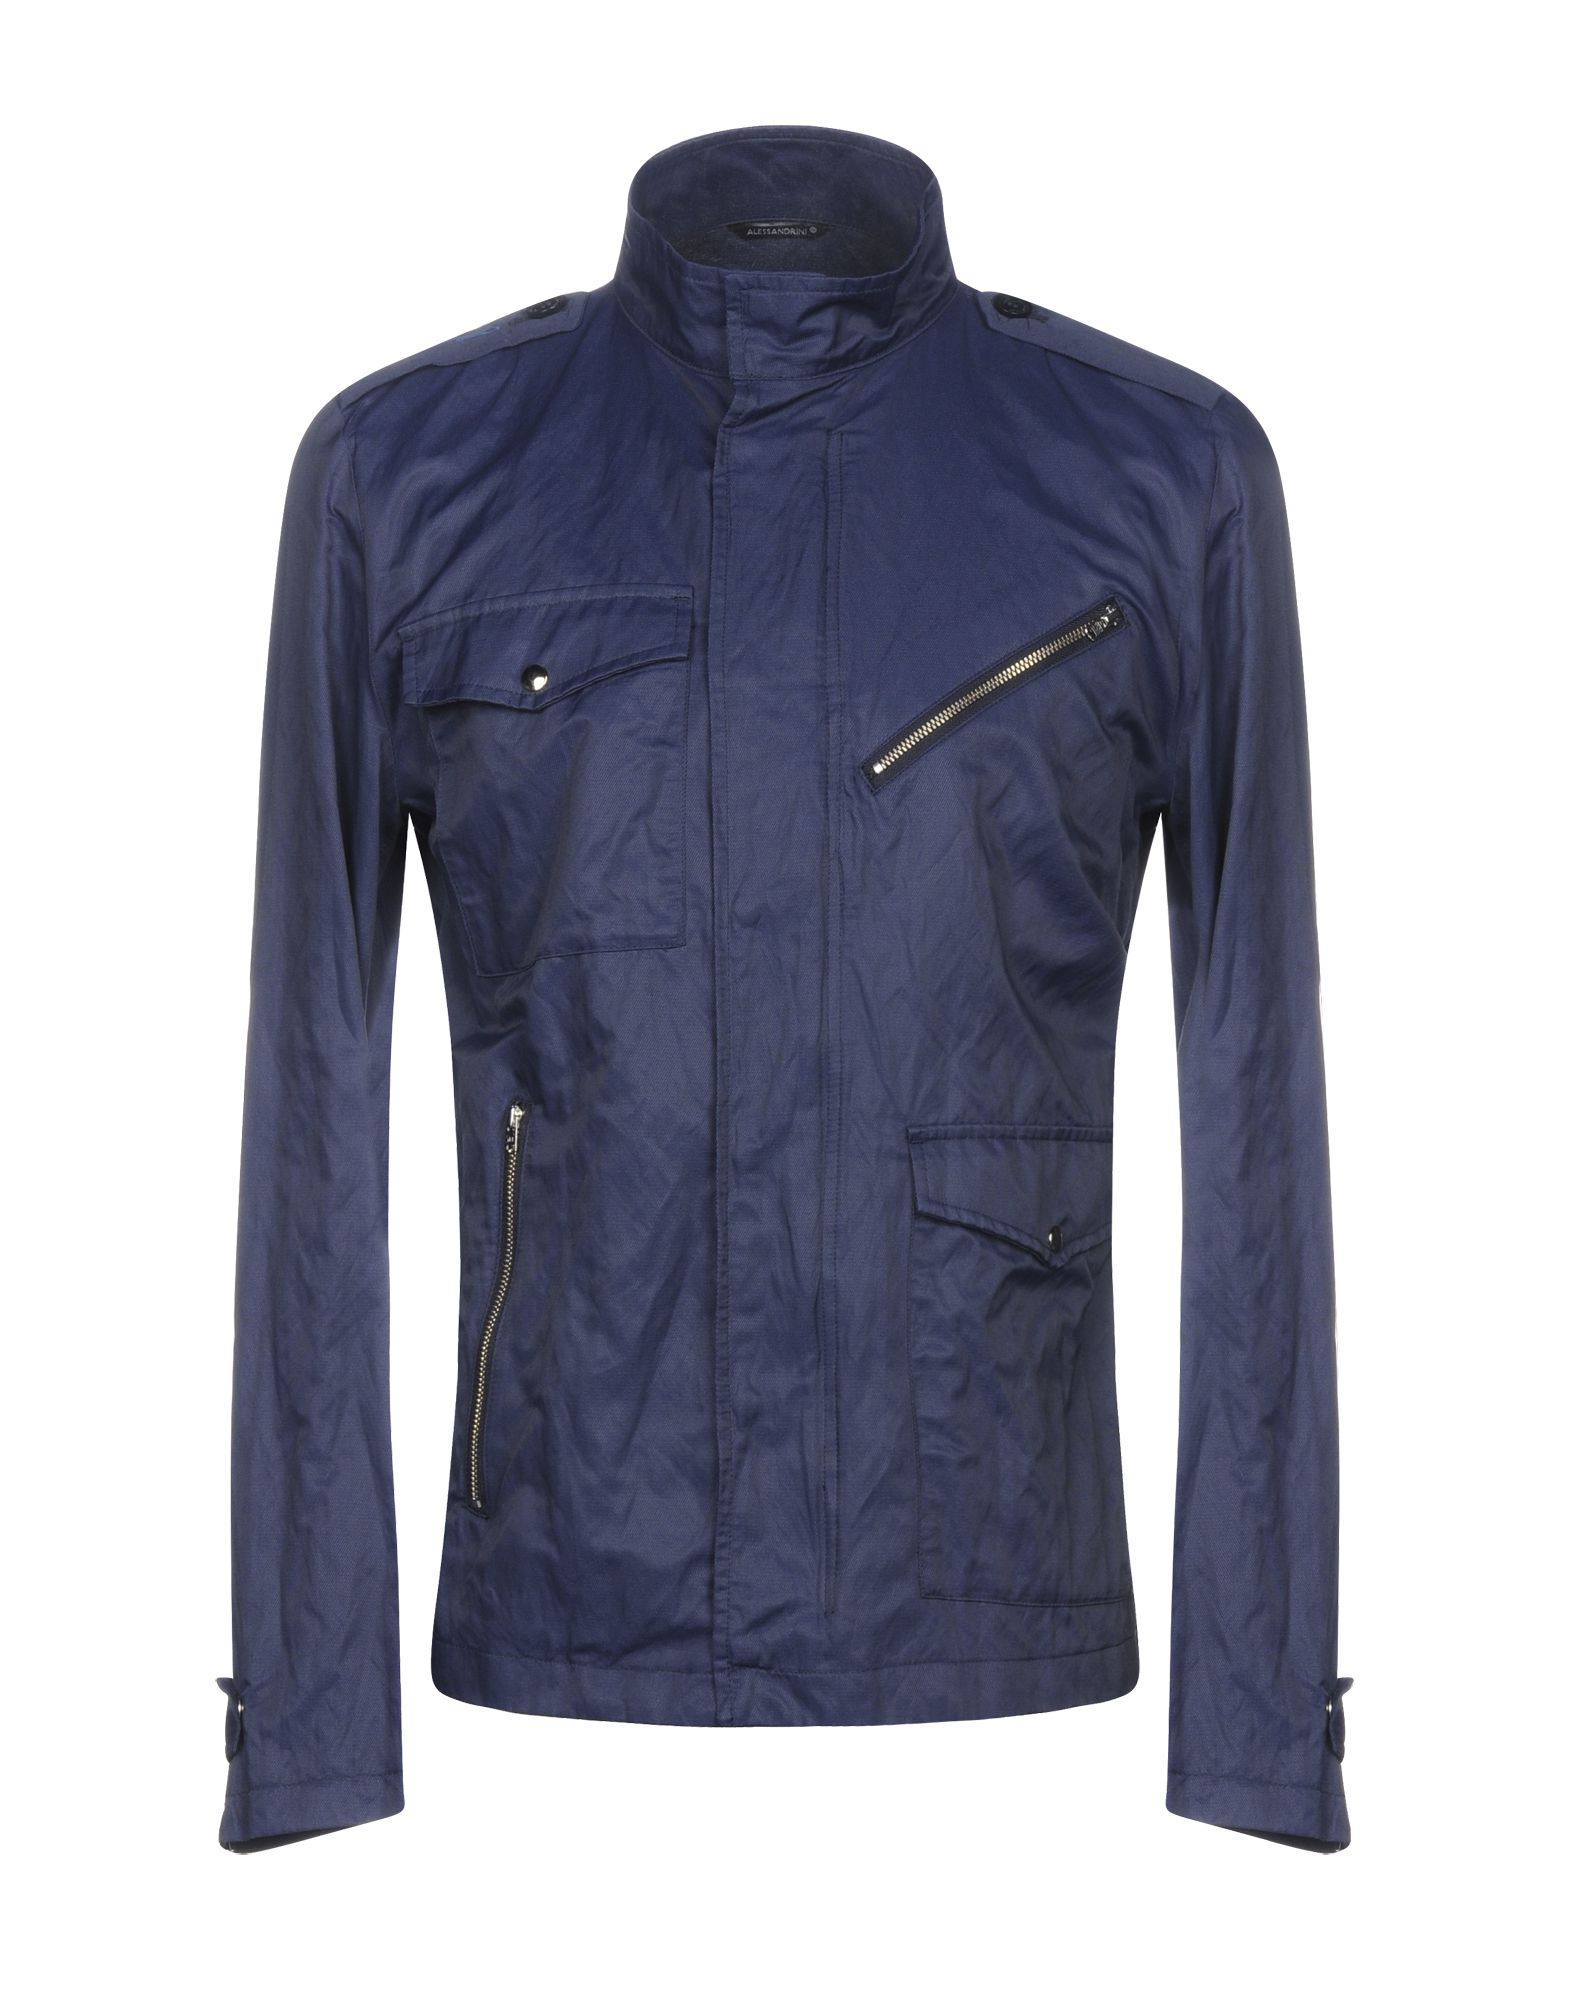 GREY DANIELE ALESSANDRINI Jackets in Dark Blue